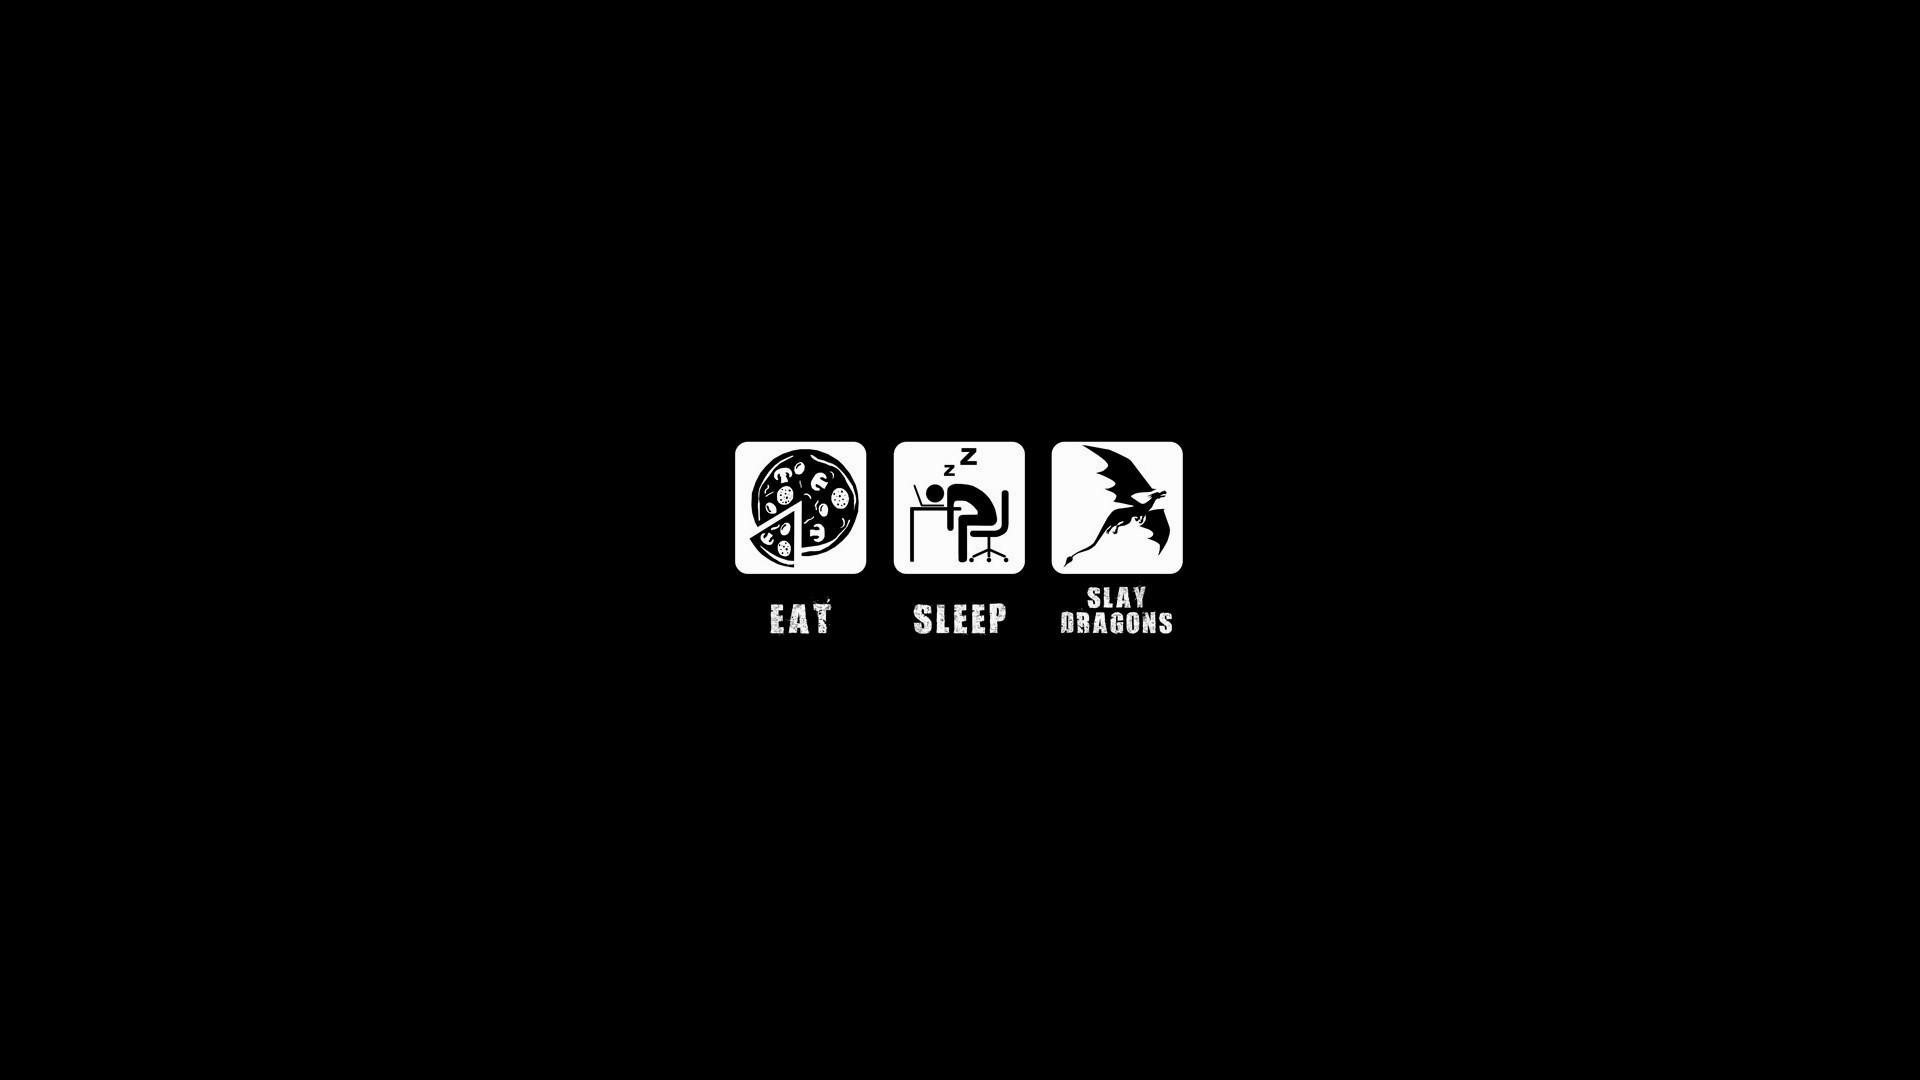 wallpaper.wiki-Eat-Sleep-Slay-Dragons-Creative-Wallpapers-HD-PIC-WPD009762